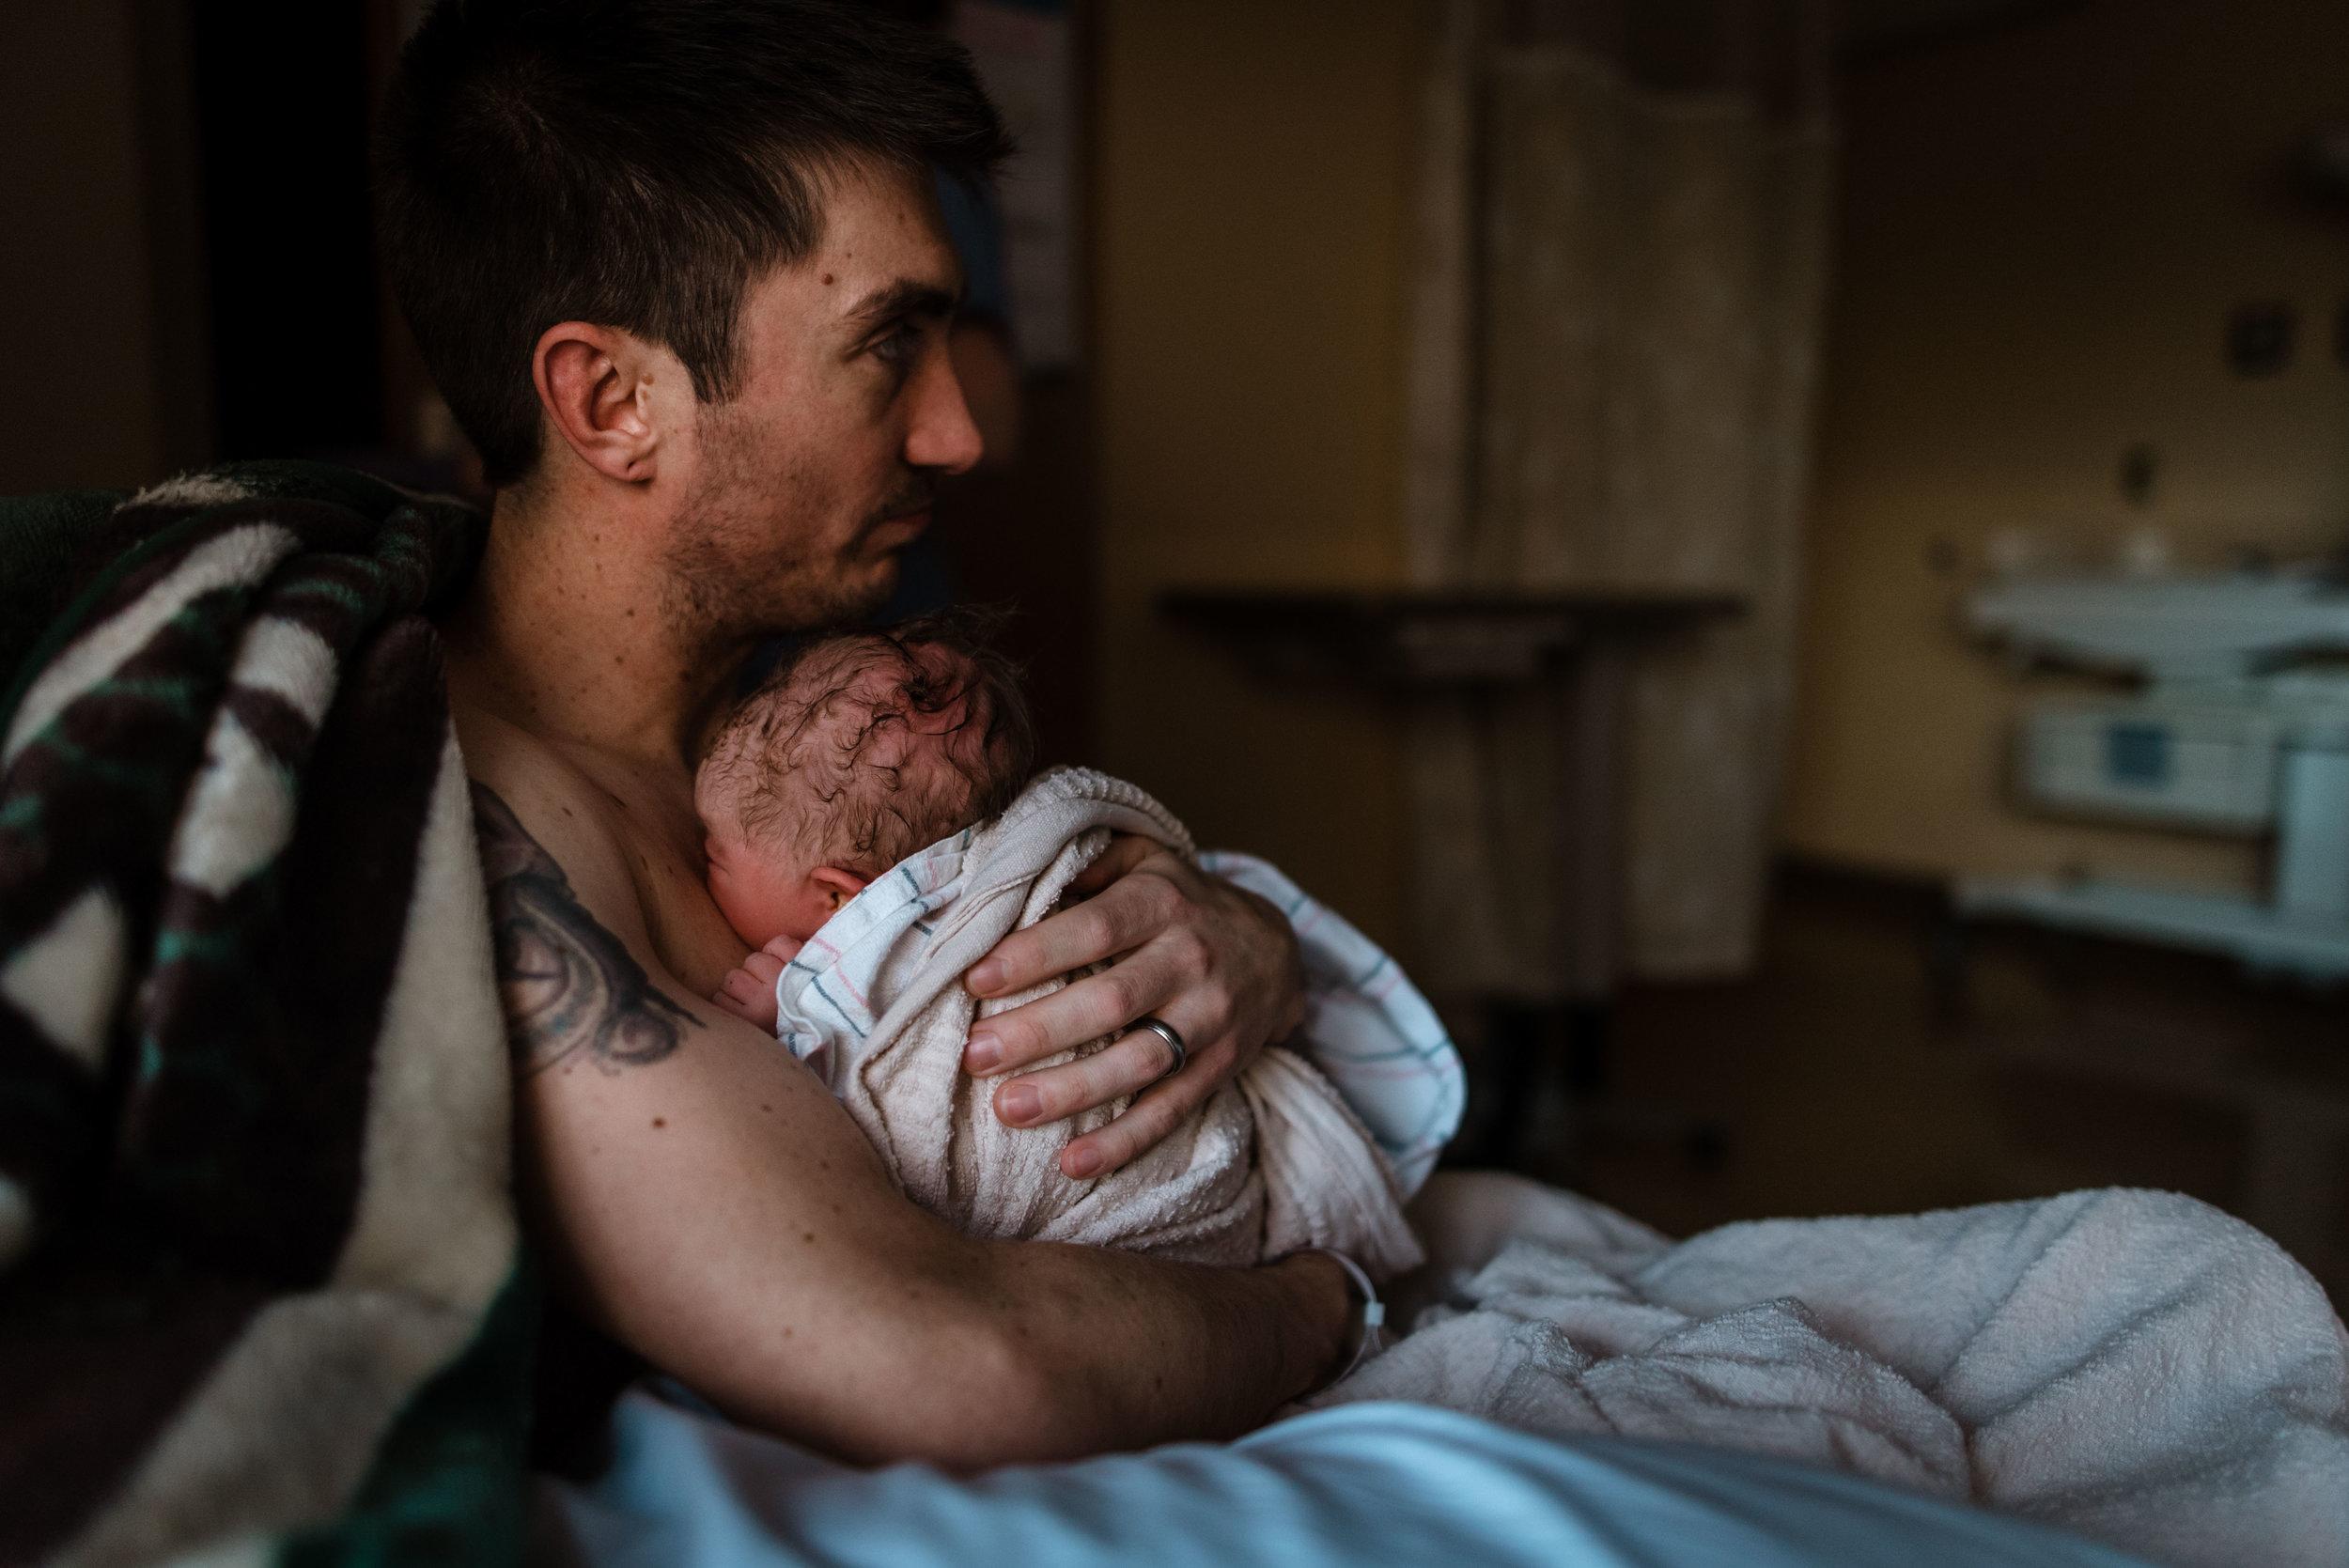 Meredith Westin Photography- Minnesota Birth Stories-January 03, 2019-144920.jpg